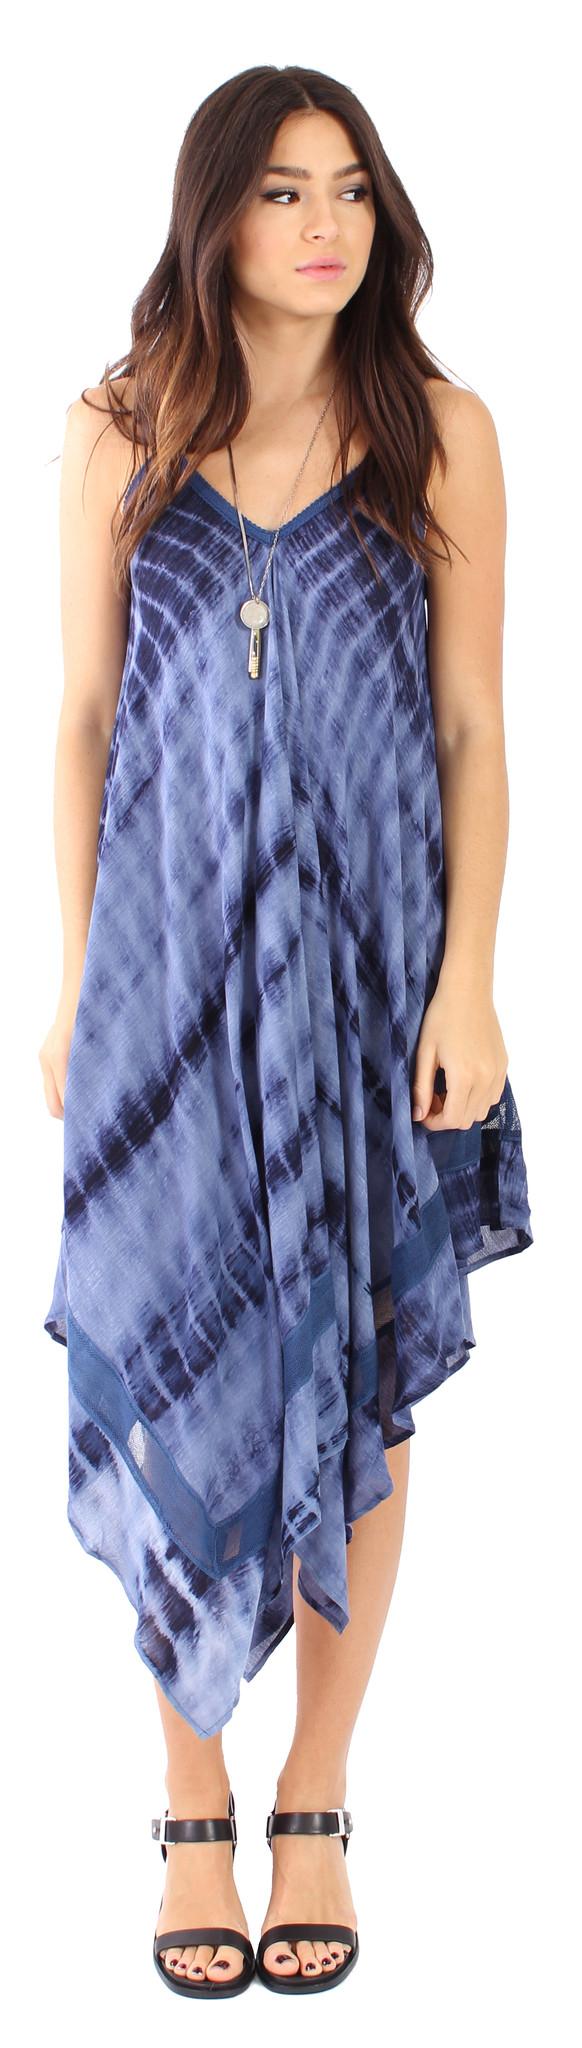 Hazel Handkerchief Dress